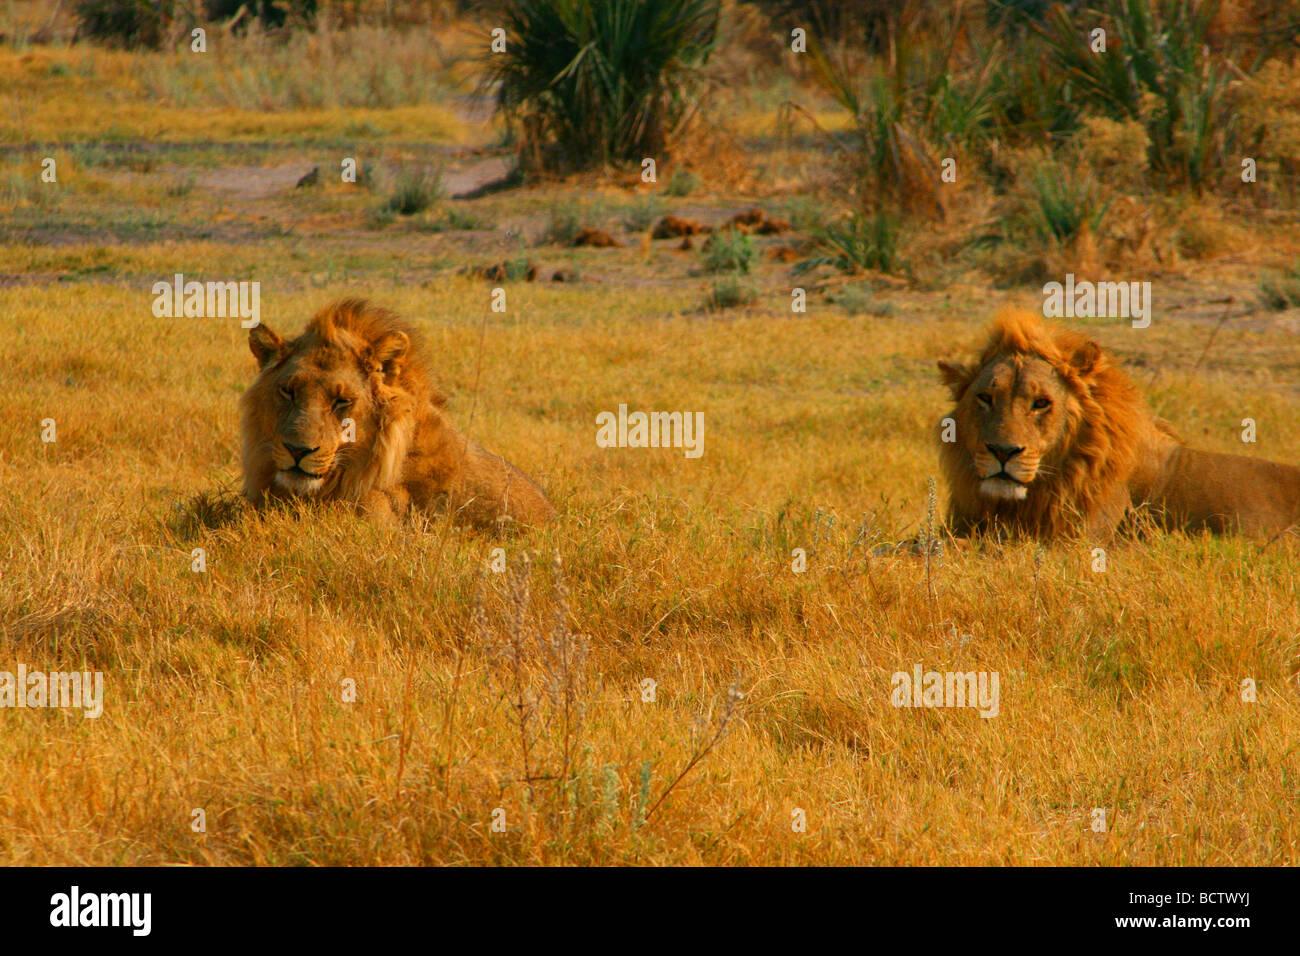 Two lions (Panthera leo) stalking games, Okavango Delta, Botswana - Stock Image